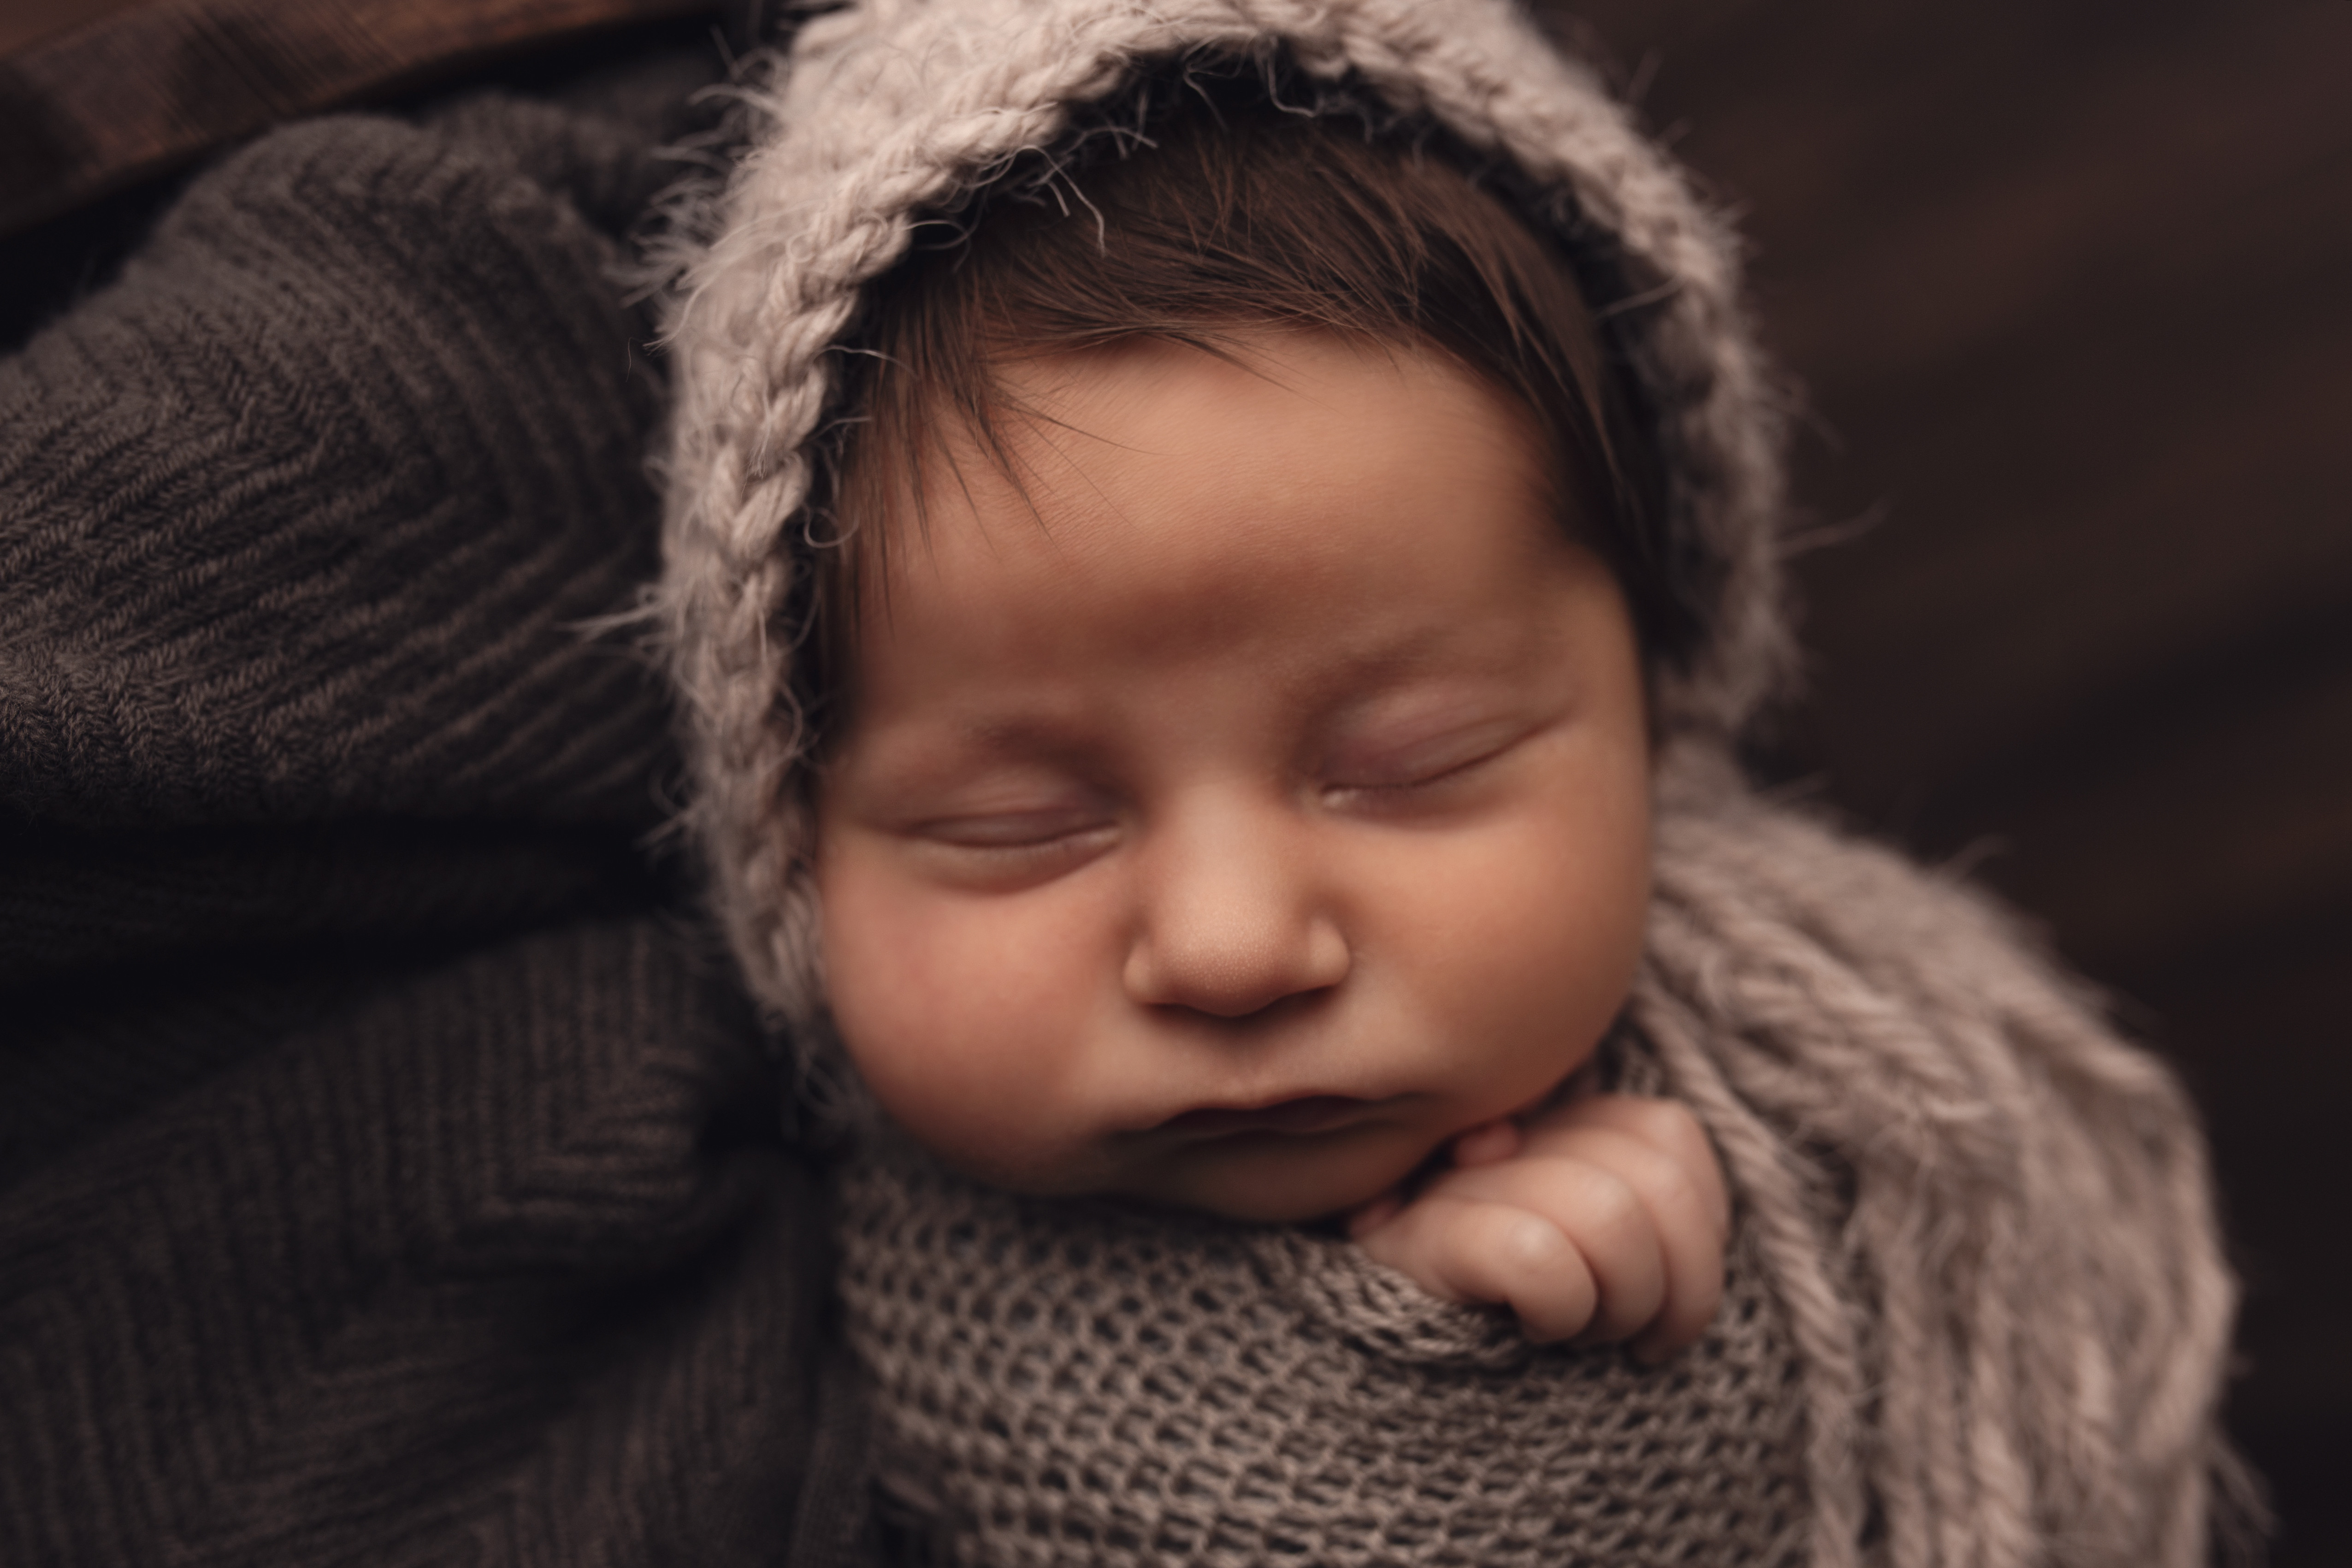 The Petite Newborn Session